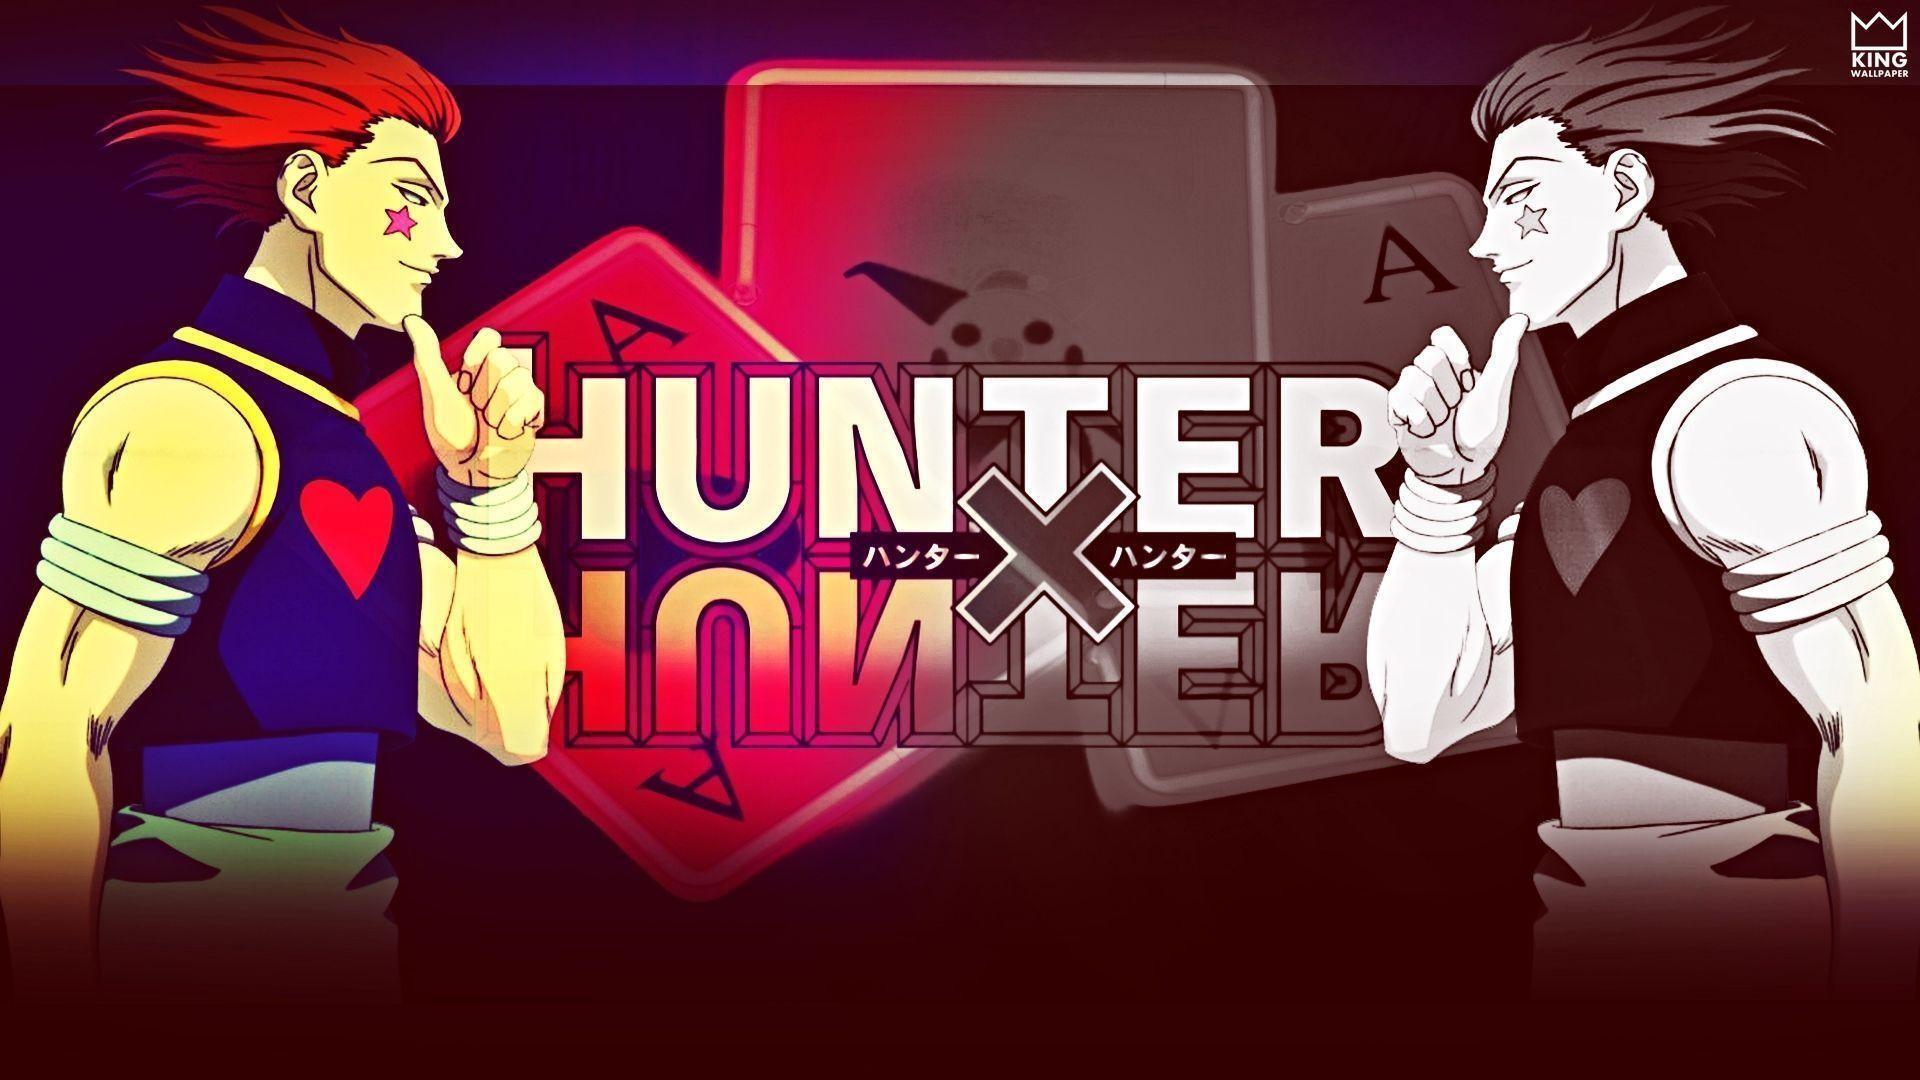 Hunter X Hunter Hisoka Wallpaper – WallpaperSafari